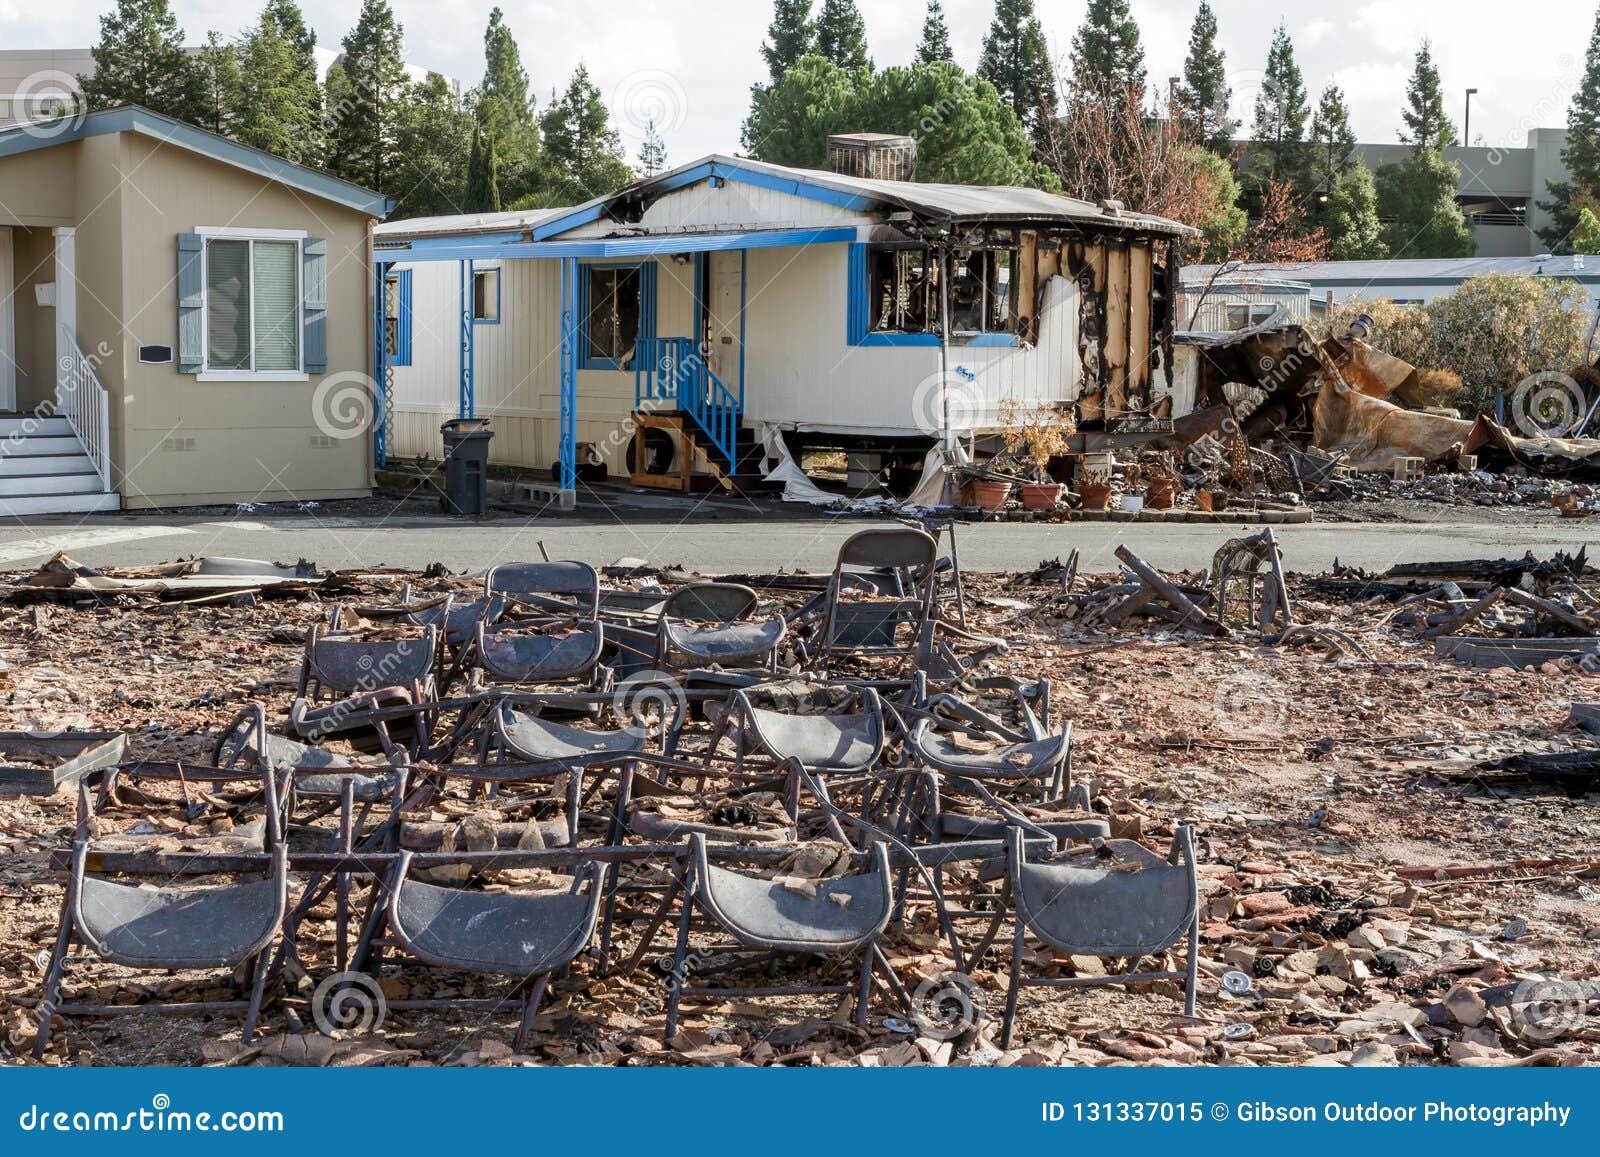 Gridando nel mirino: Un mese dopo Sonoma 2017 Coun